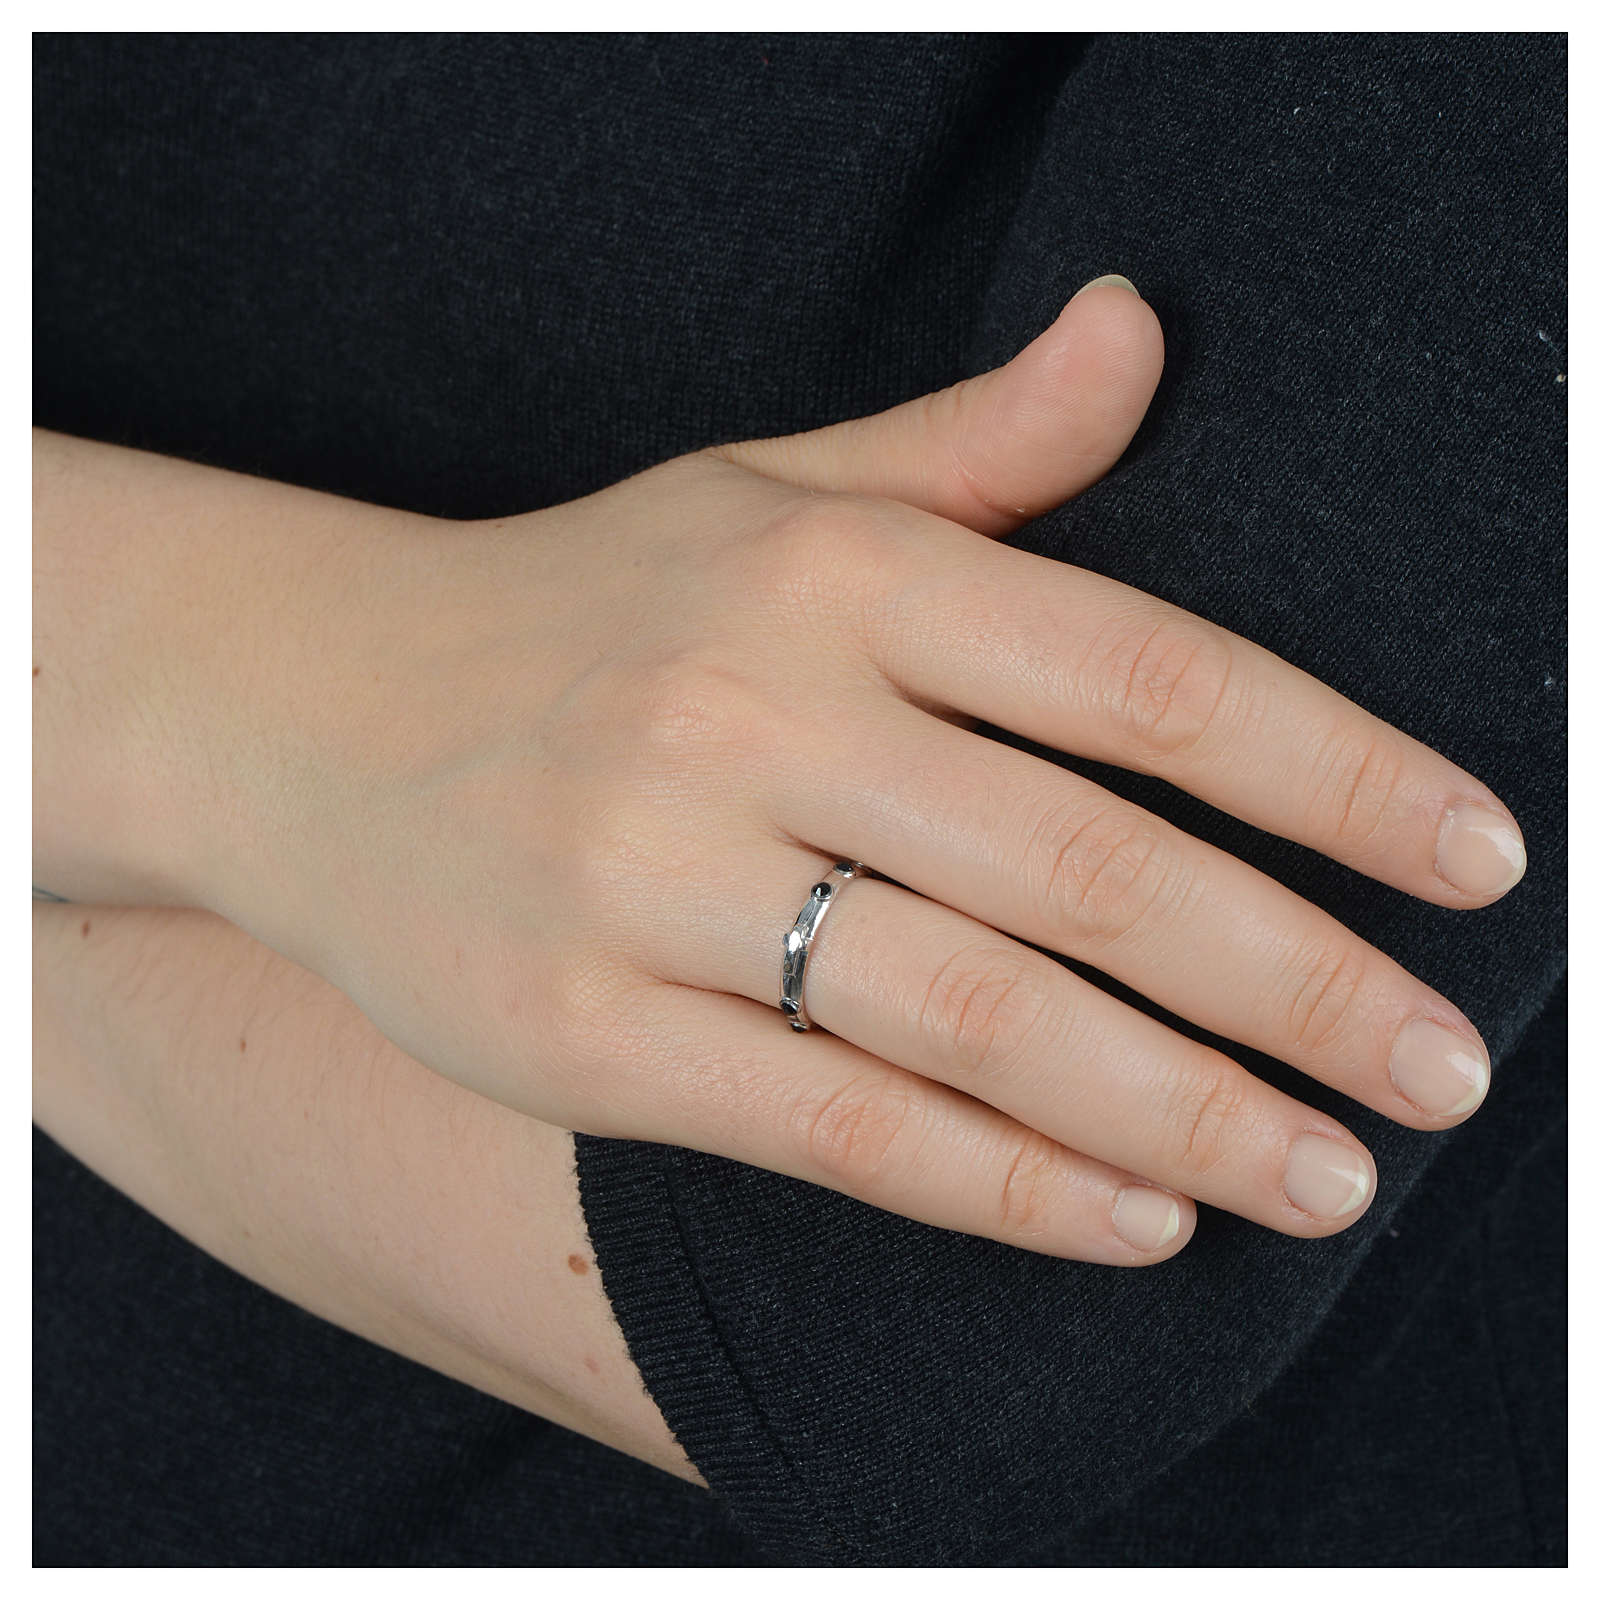 Single-decade ring in 925 silver and black Swarovski crystals 3